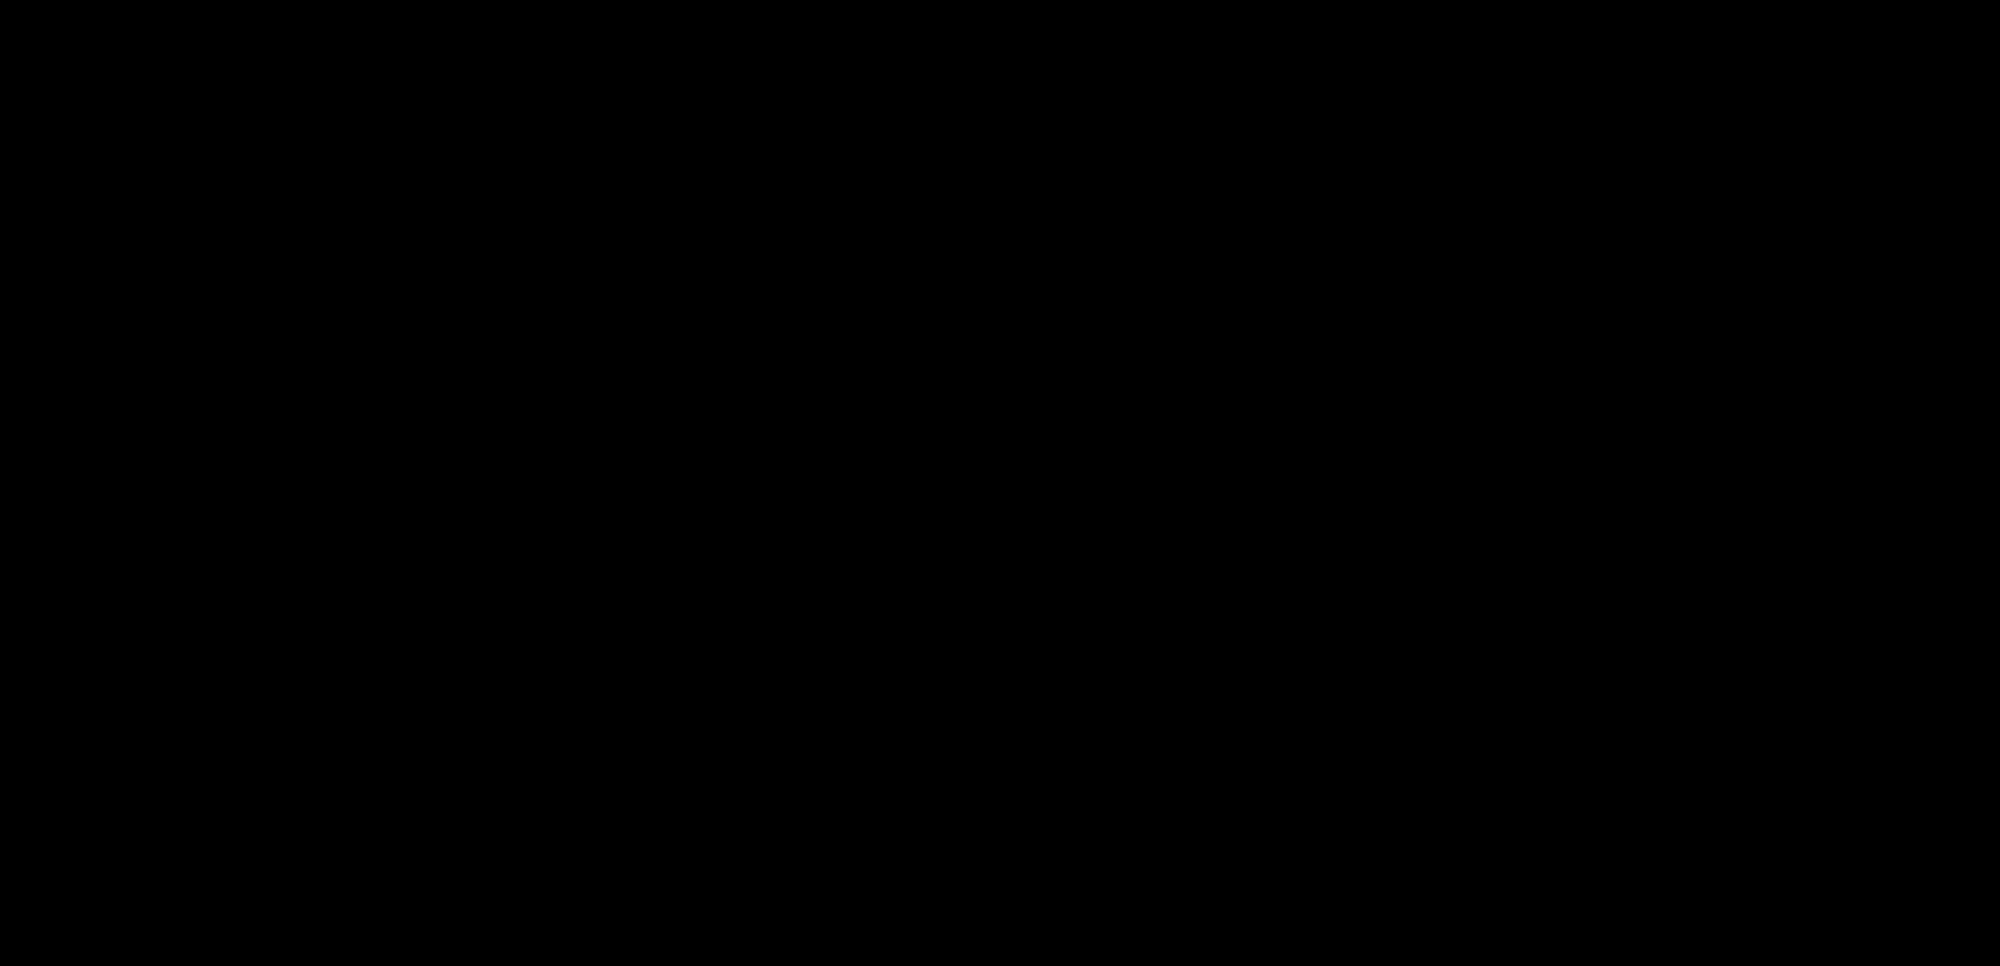 Gobana Logo photo - 1